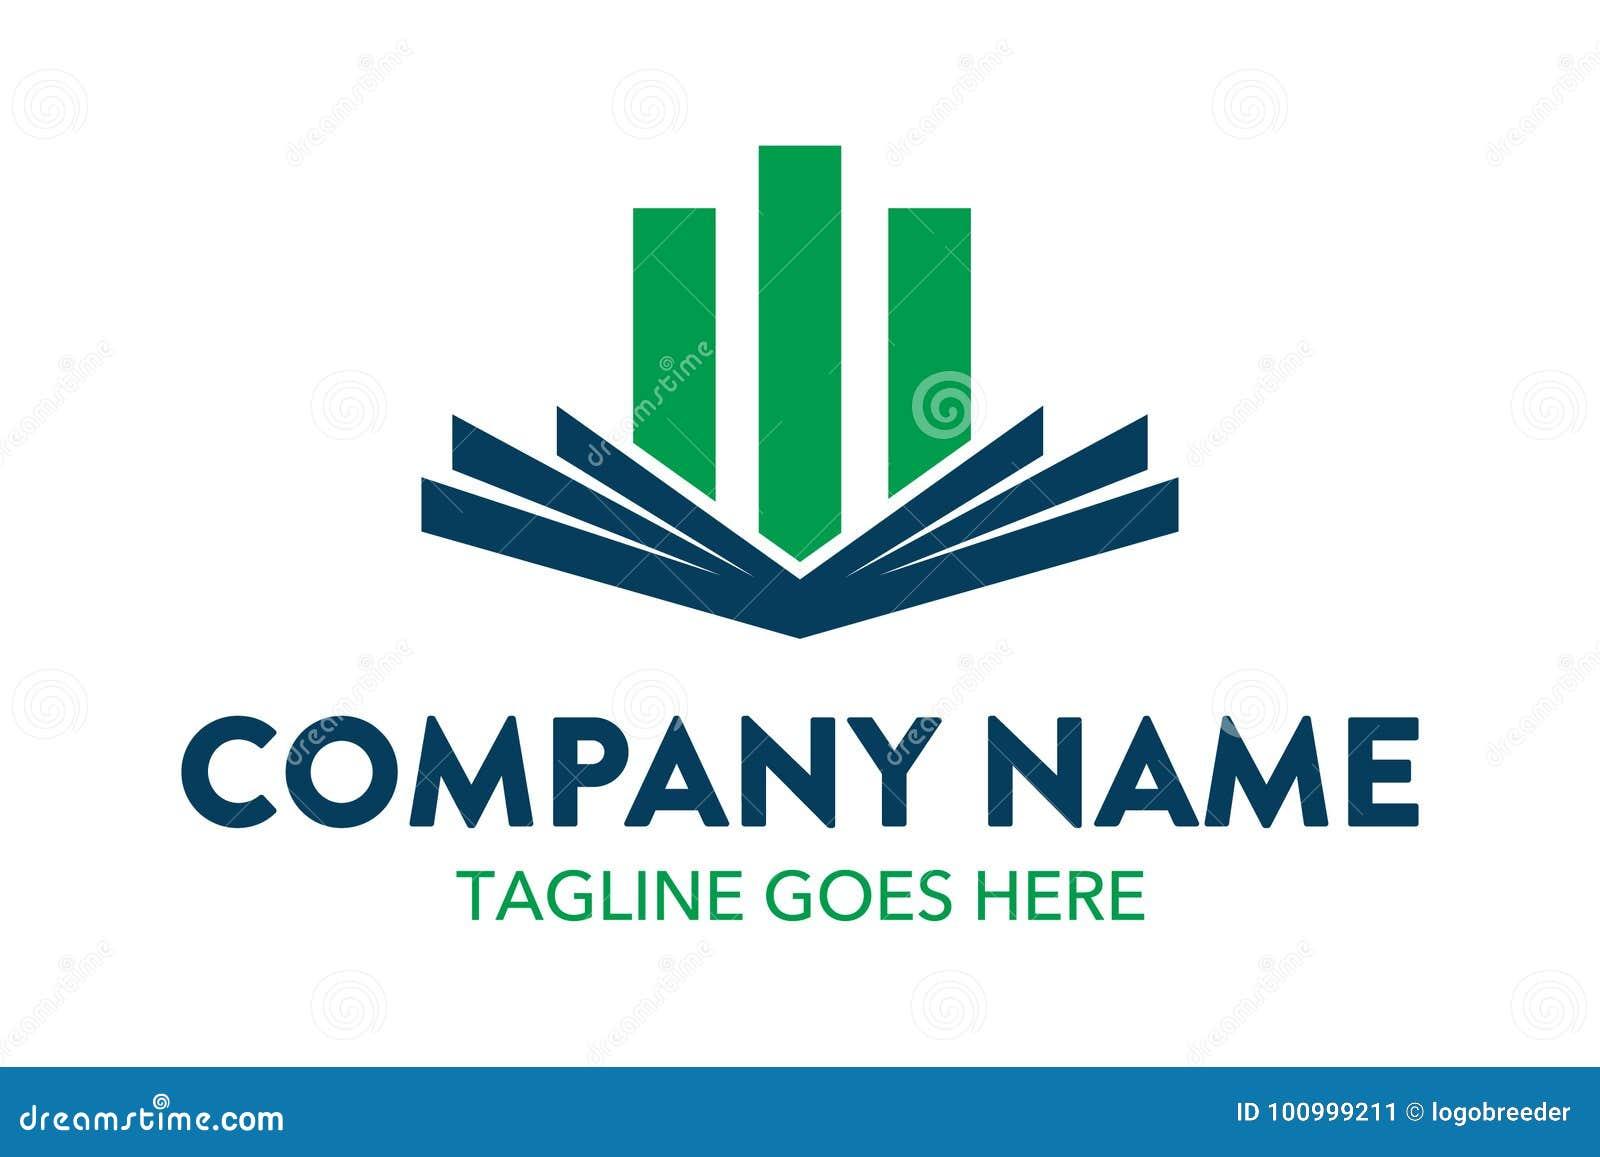 Unique And Original Education Logo Template Simple Shape Minimalist Color Memorable